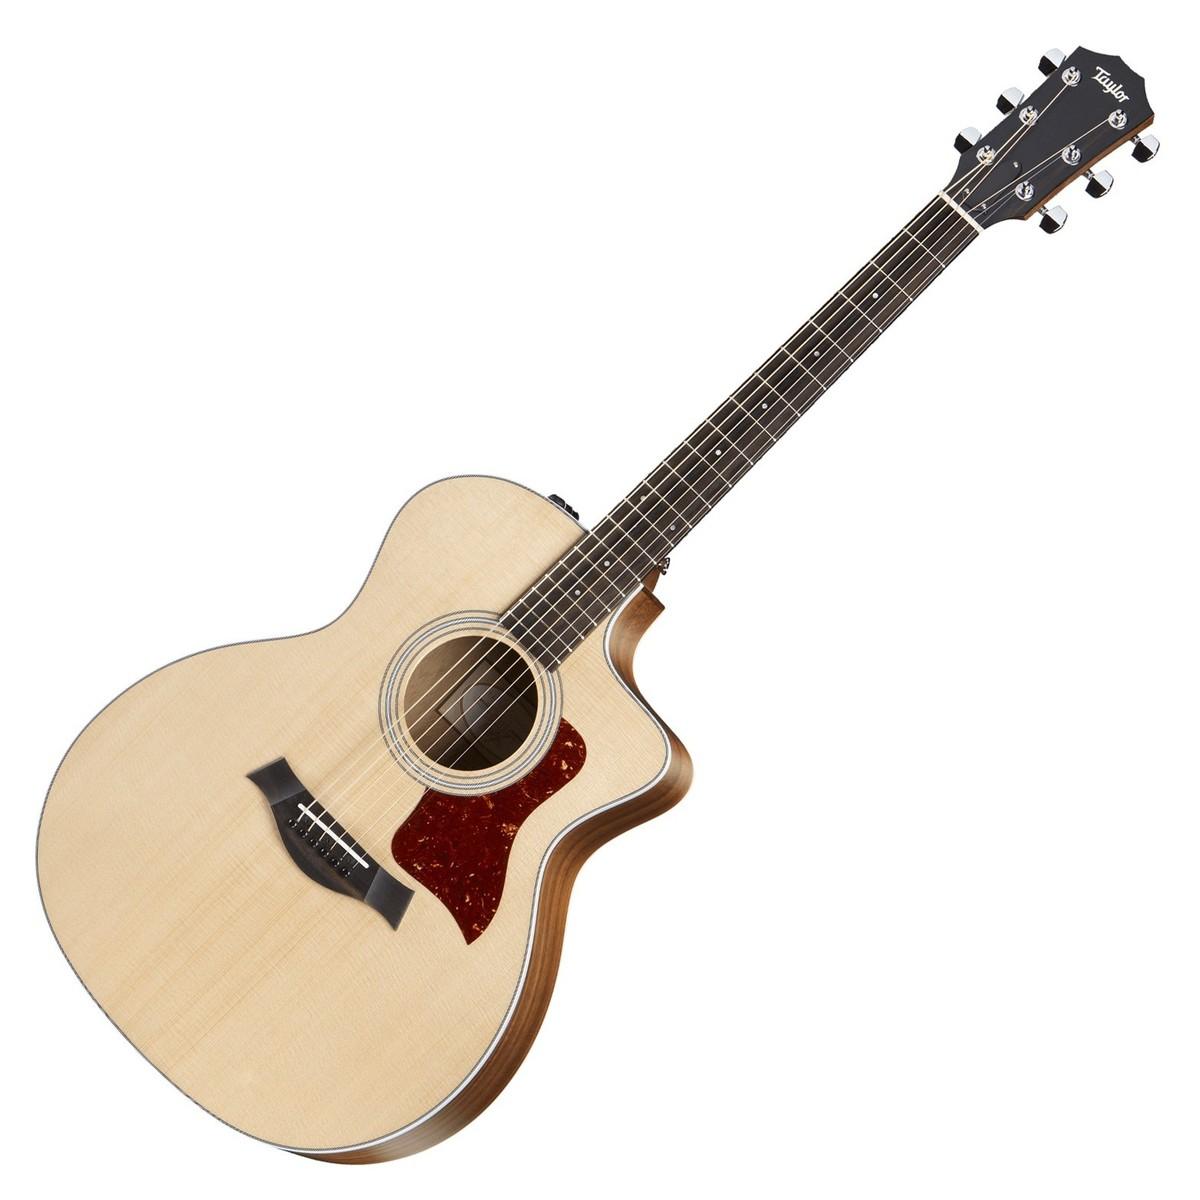 taylor 214ce grand auditorium electro acoustic guitar 2017 at. Black Bedroom Furniture Sets. Home Design Ideas